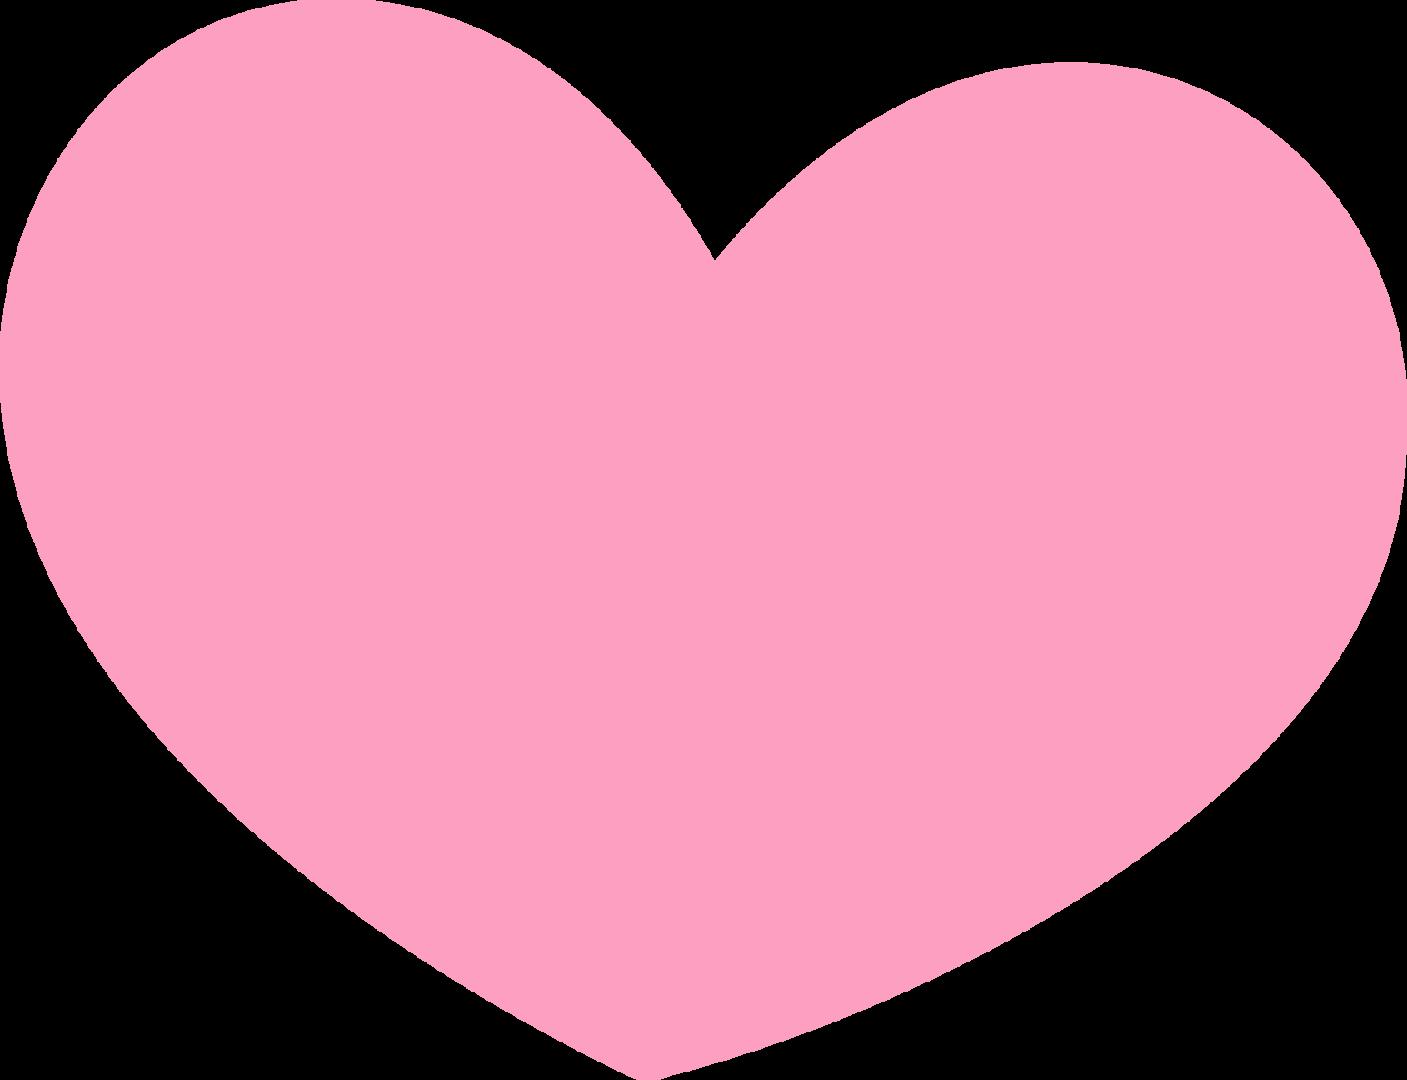 4shared Ver Todas Las Imagenes De La Carpeta Png Baby Art Crafts Cute Love Wallpapers Heart Wallpaper